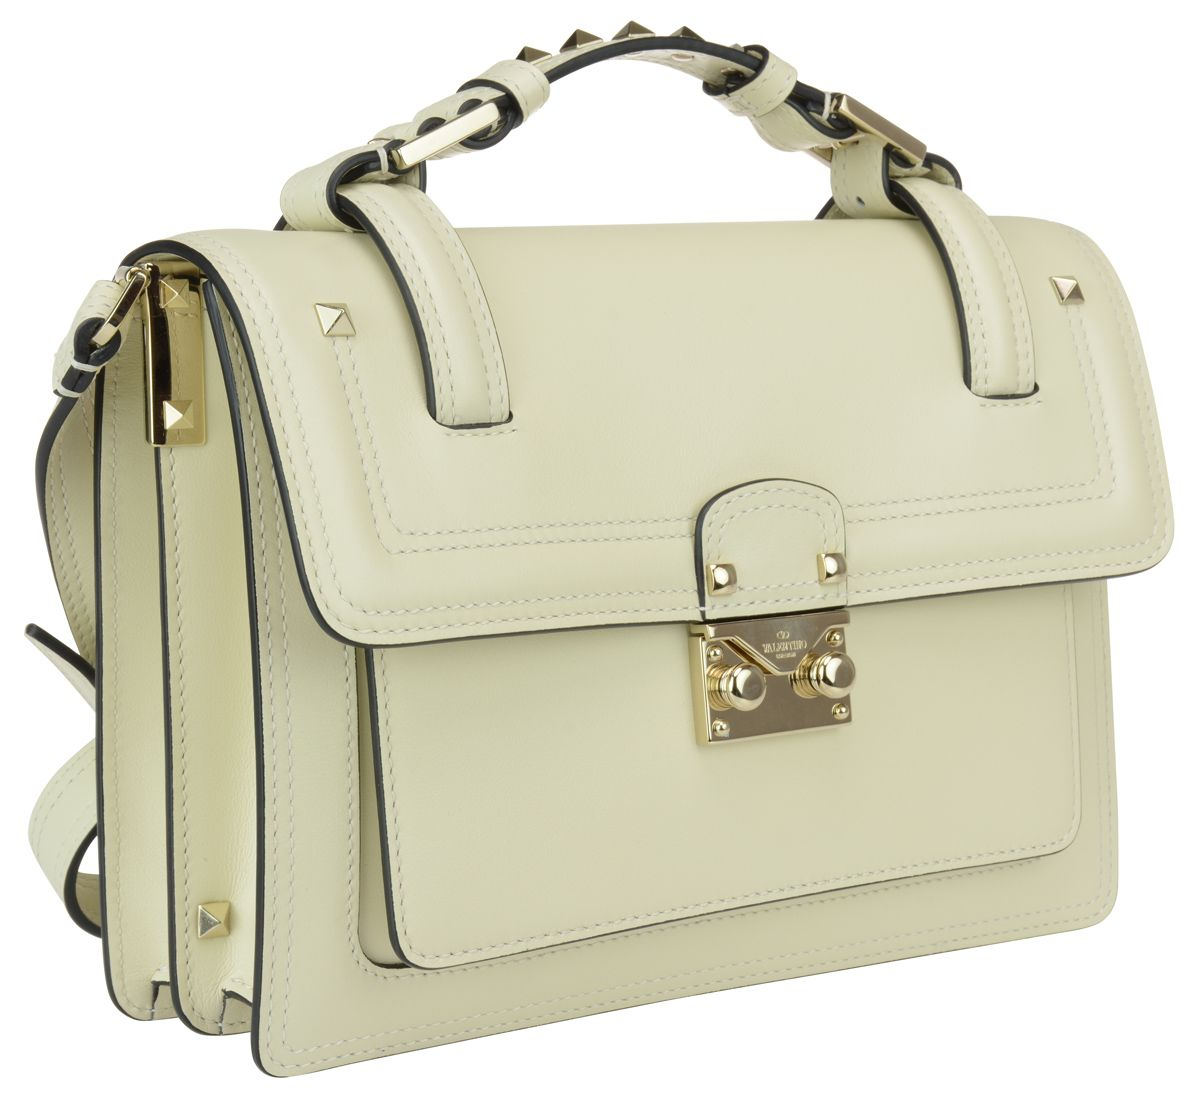 Valentino My Rockstud Bag